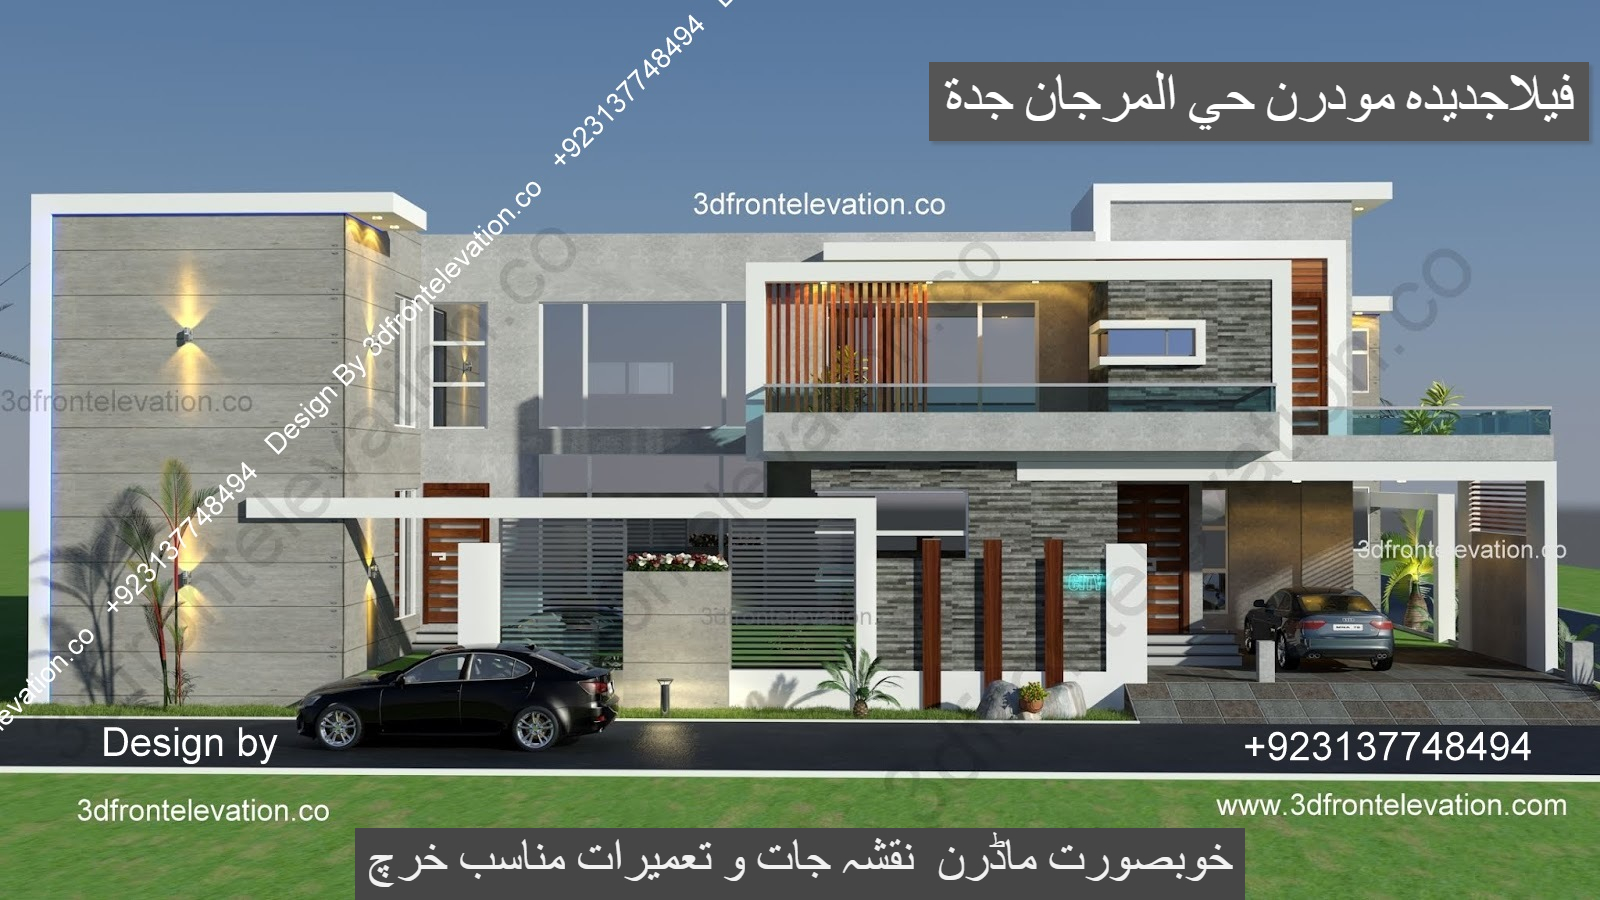 Modern islamic design villa in saudi arabia neom city oman dubai australia kuwait american house plan